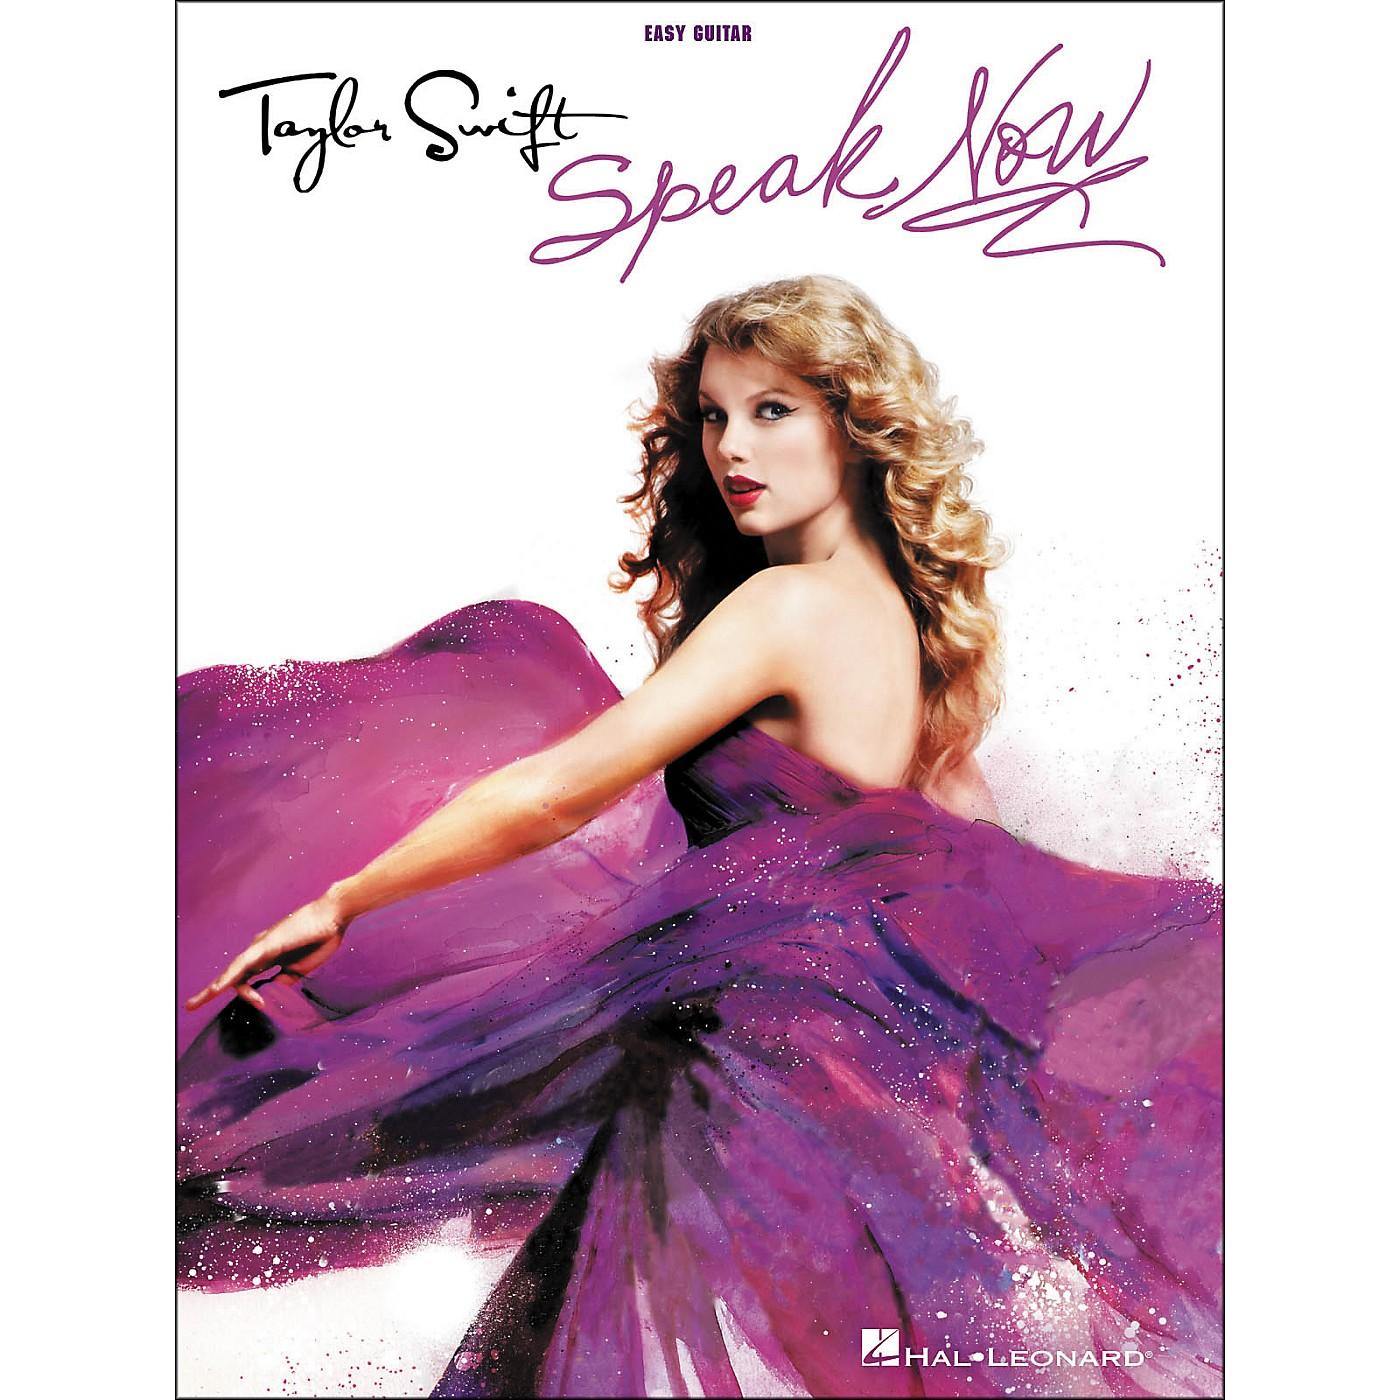 Hal Leonard Taylor Swift - Speak Now (Easy Guitar With Tab) thumbnail